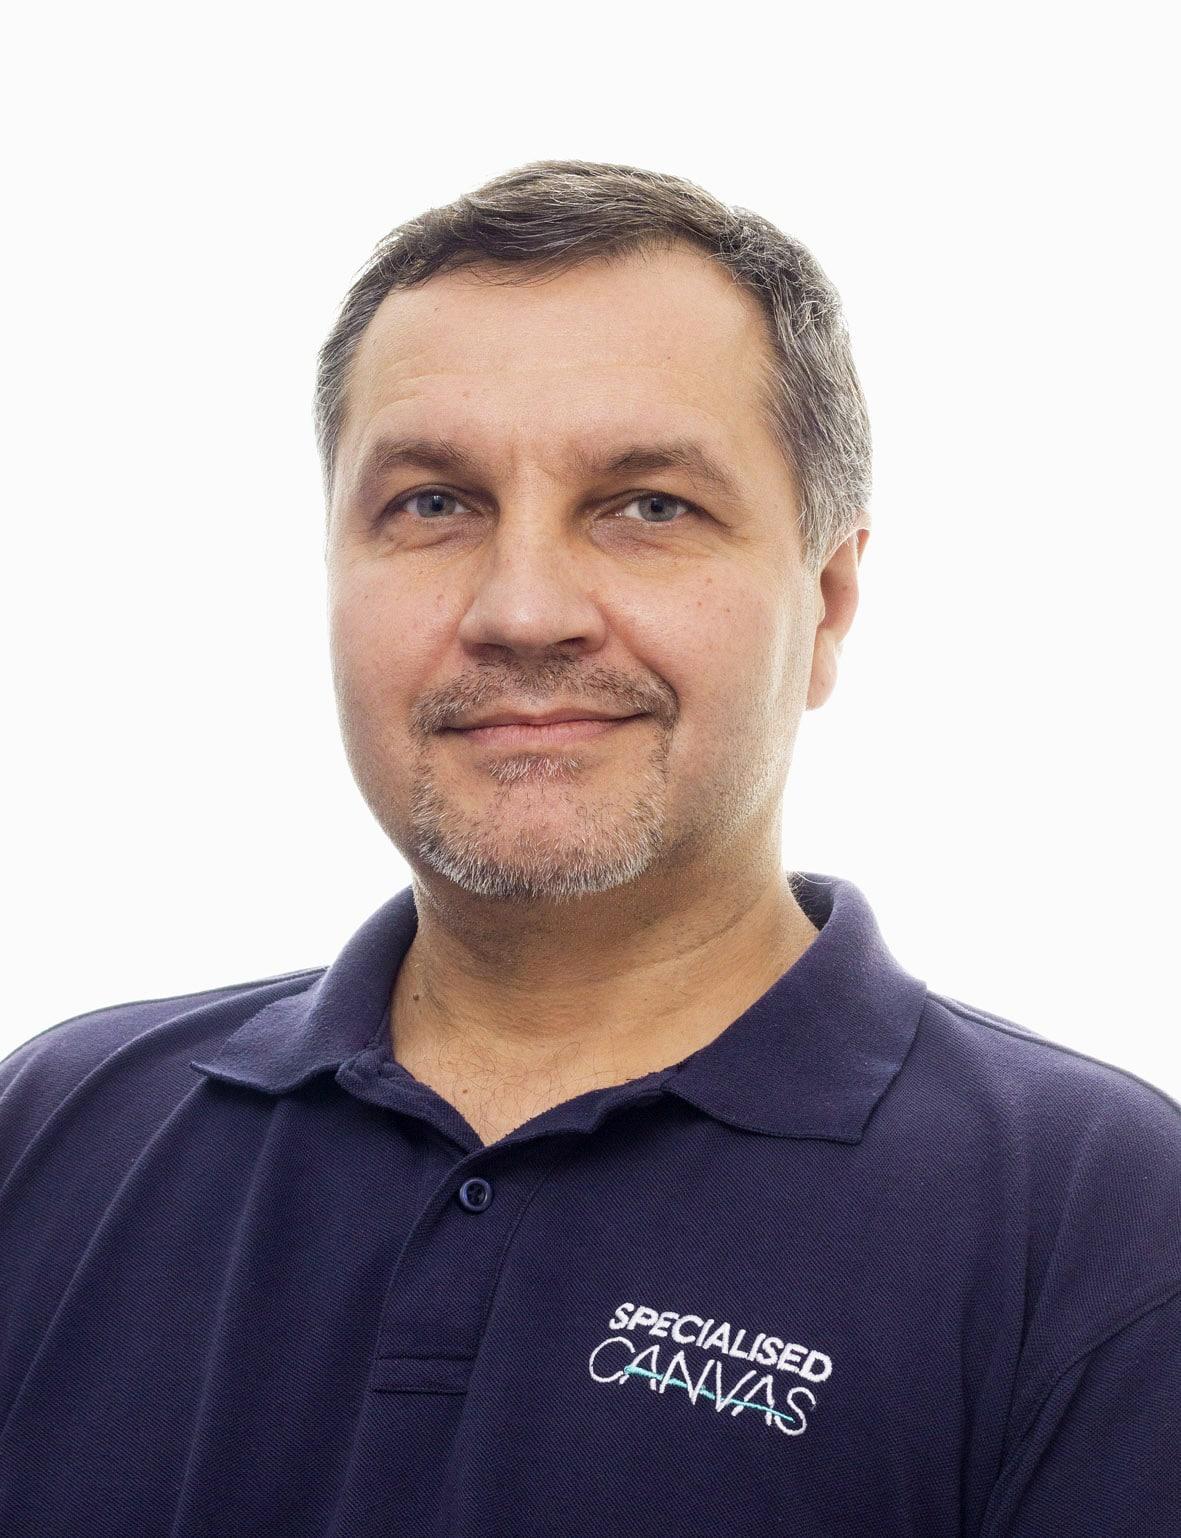 Kris Kisilewicz